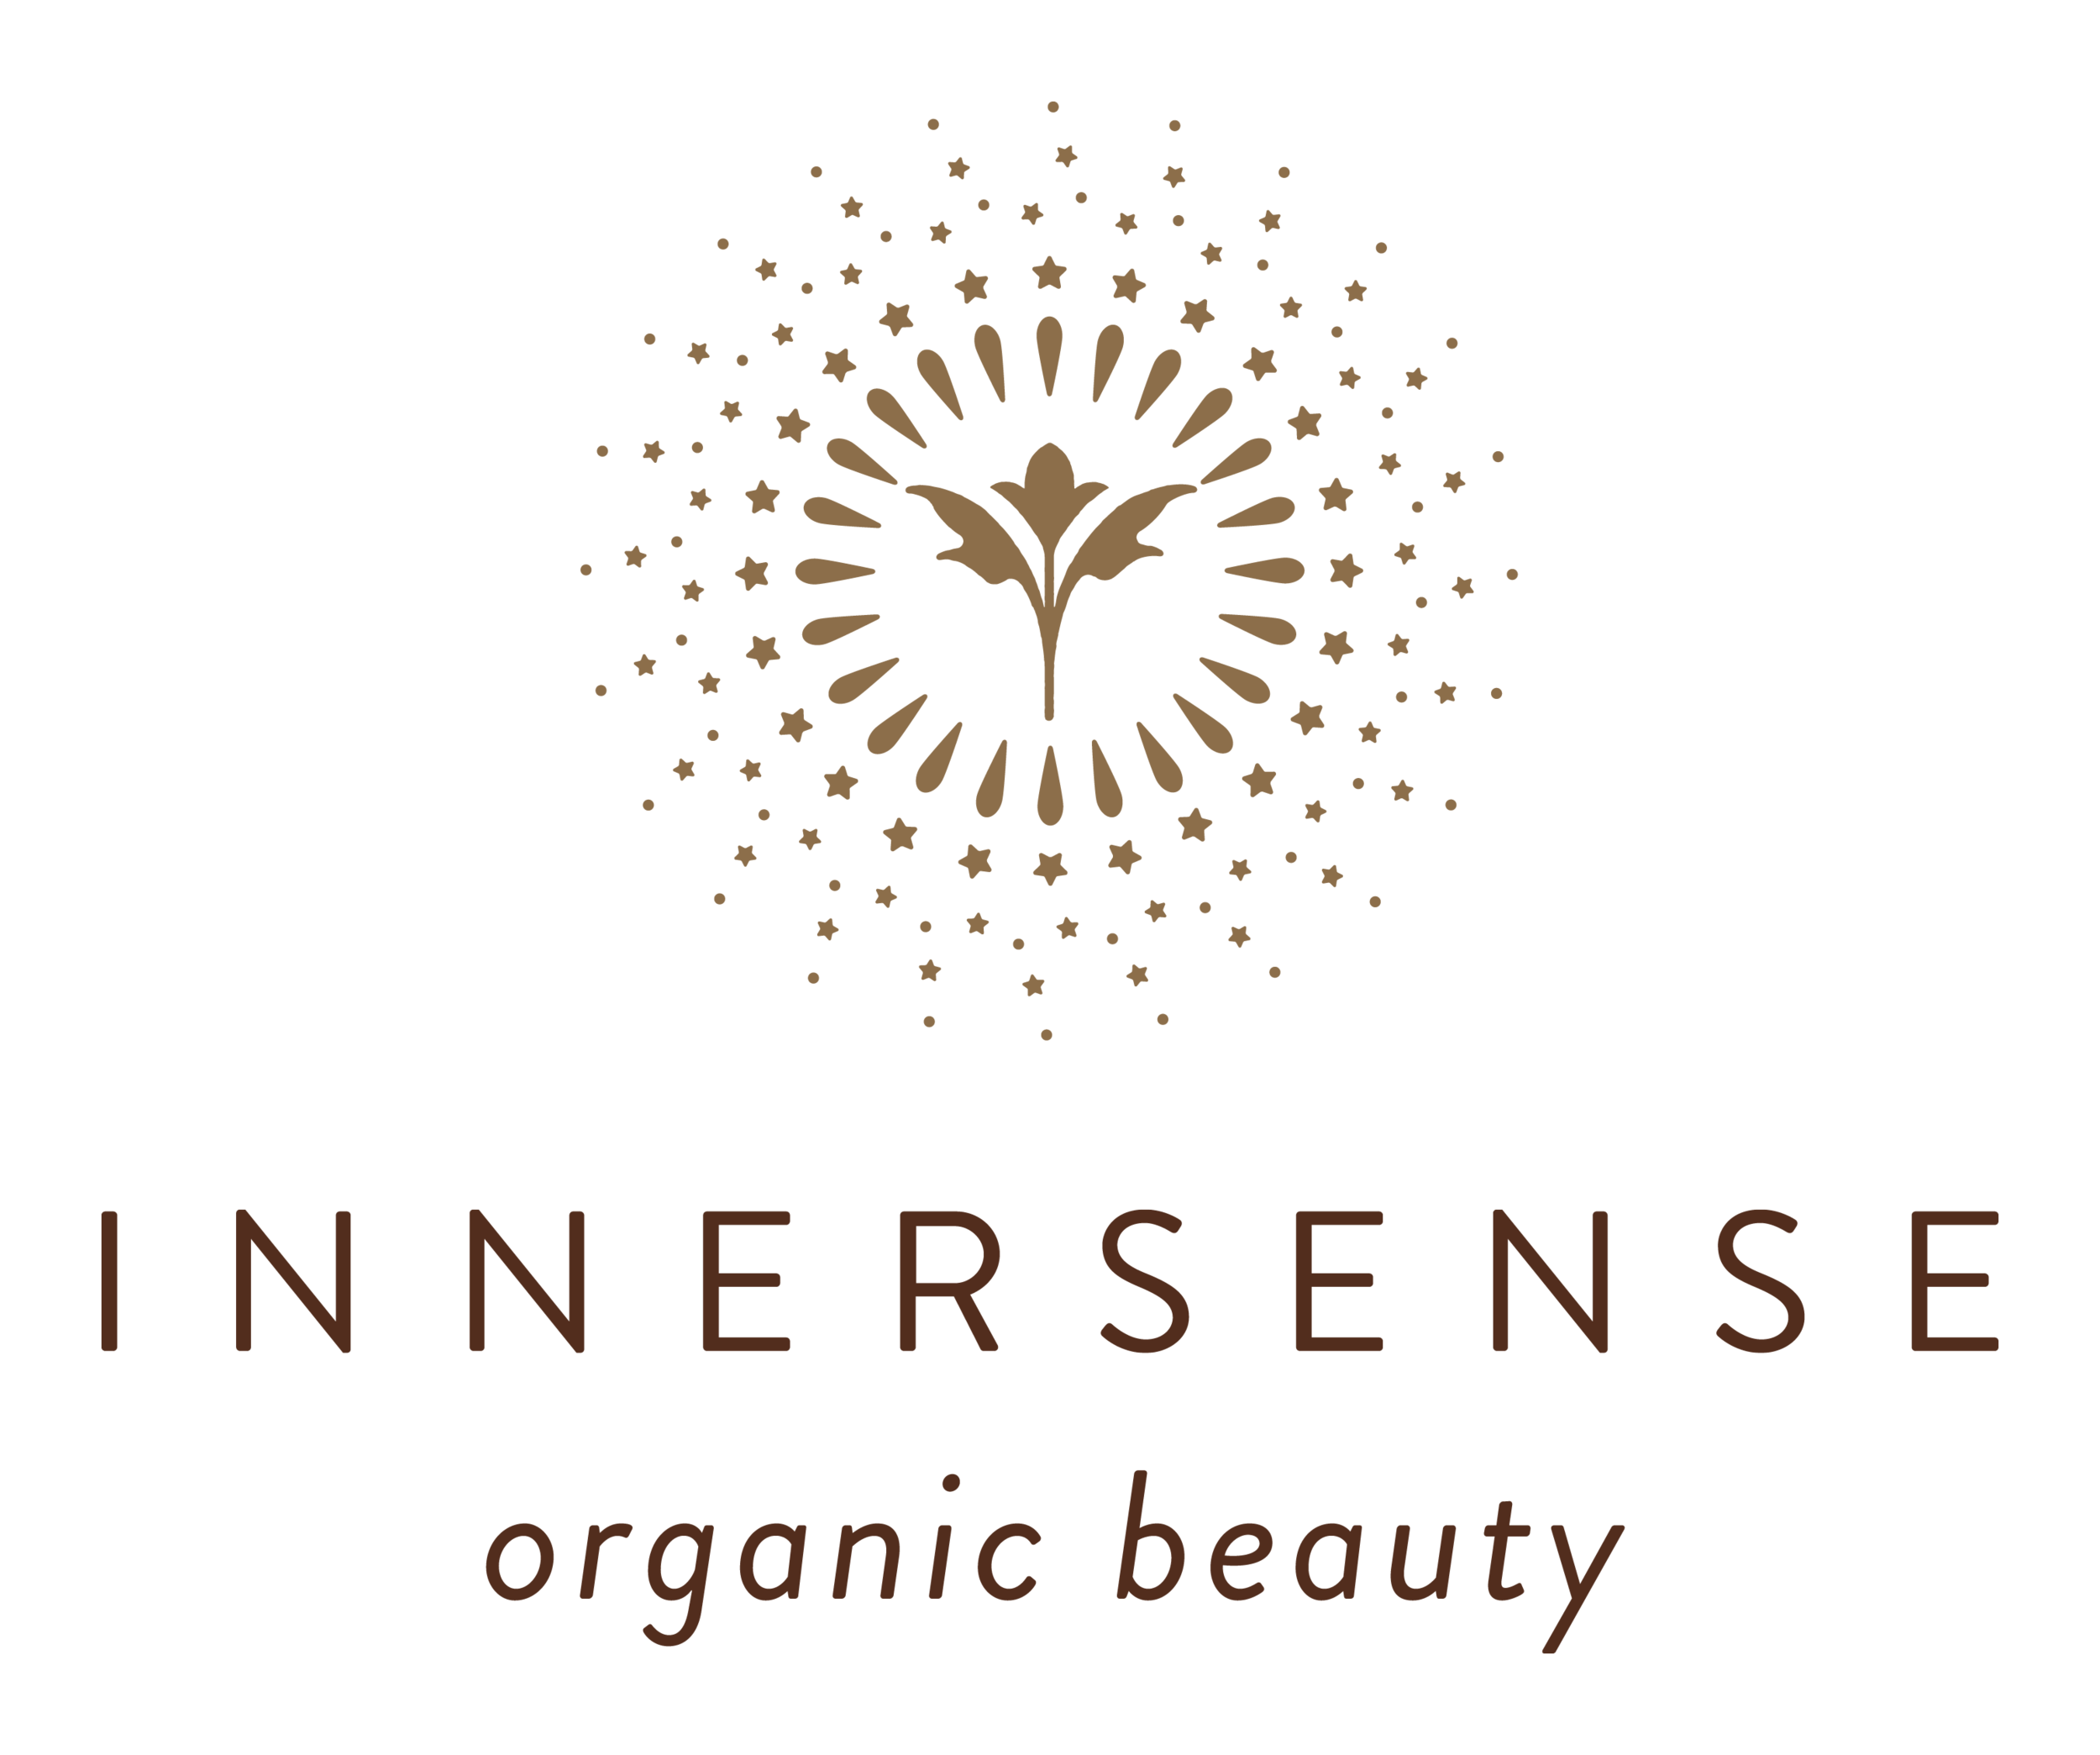 innersense Organic Beauty.png